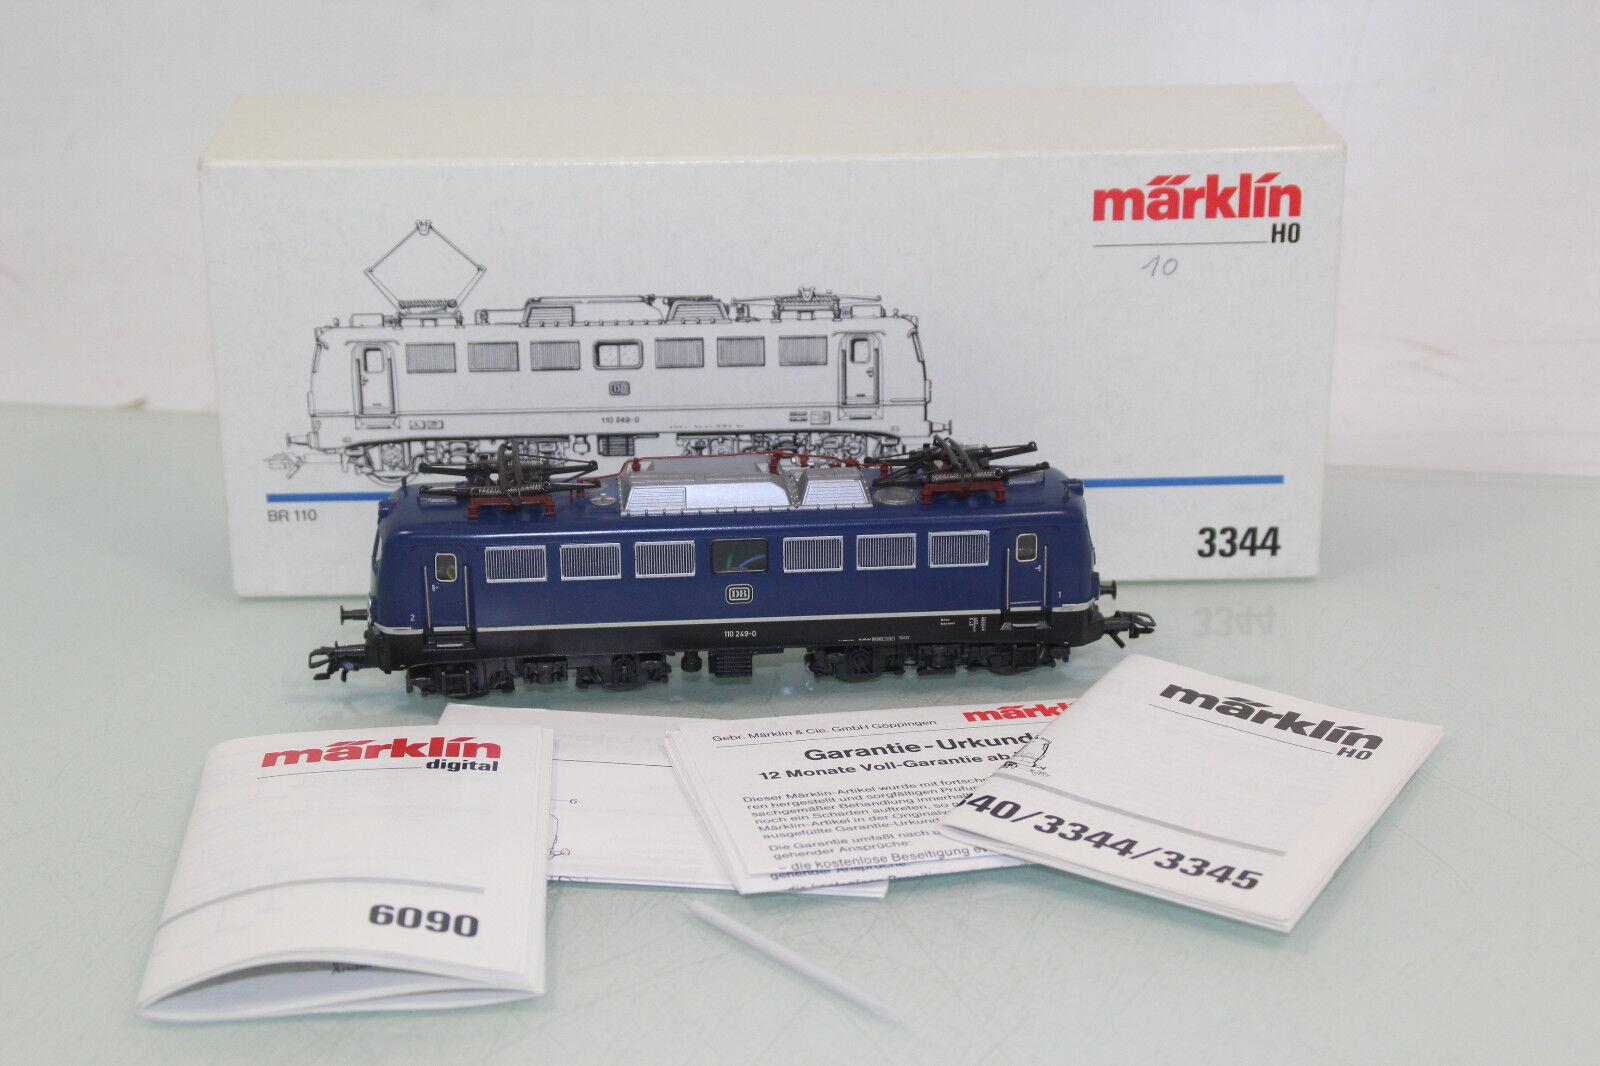 Märklin H0 3344 E-Lok BR 110 110 110 249-0 der DB Digital-Umbau in OVP (SL4613)    Mittel Preis  eb751d